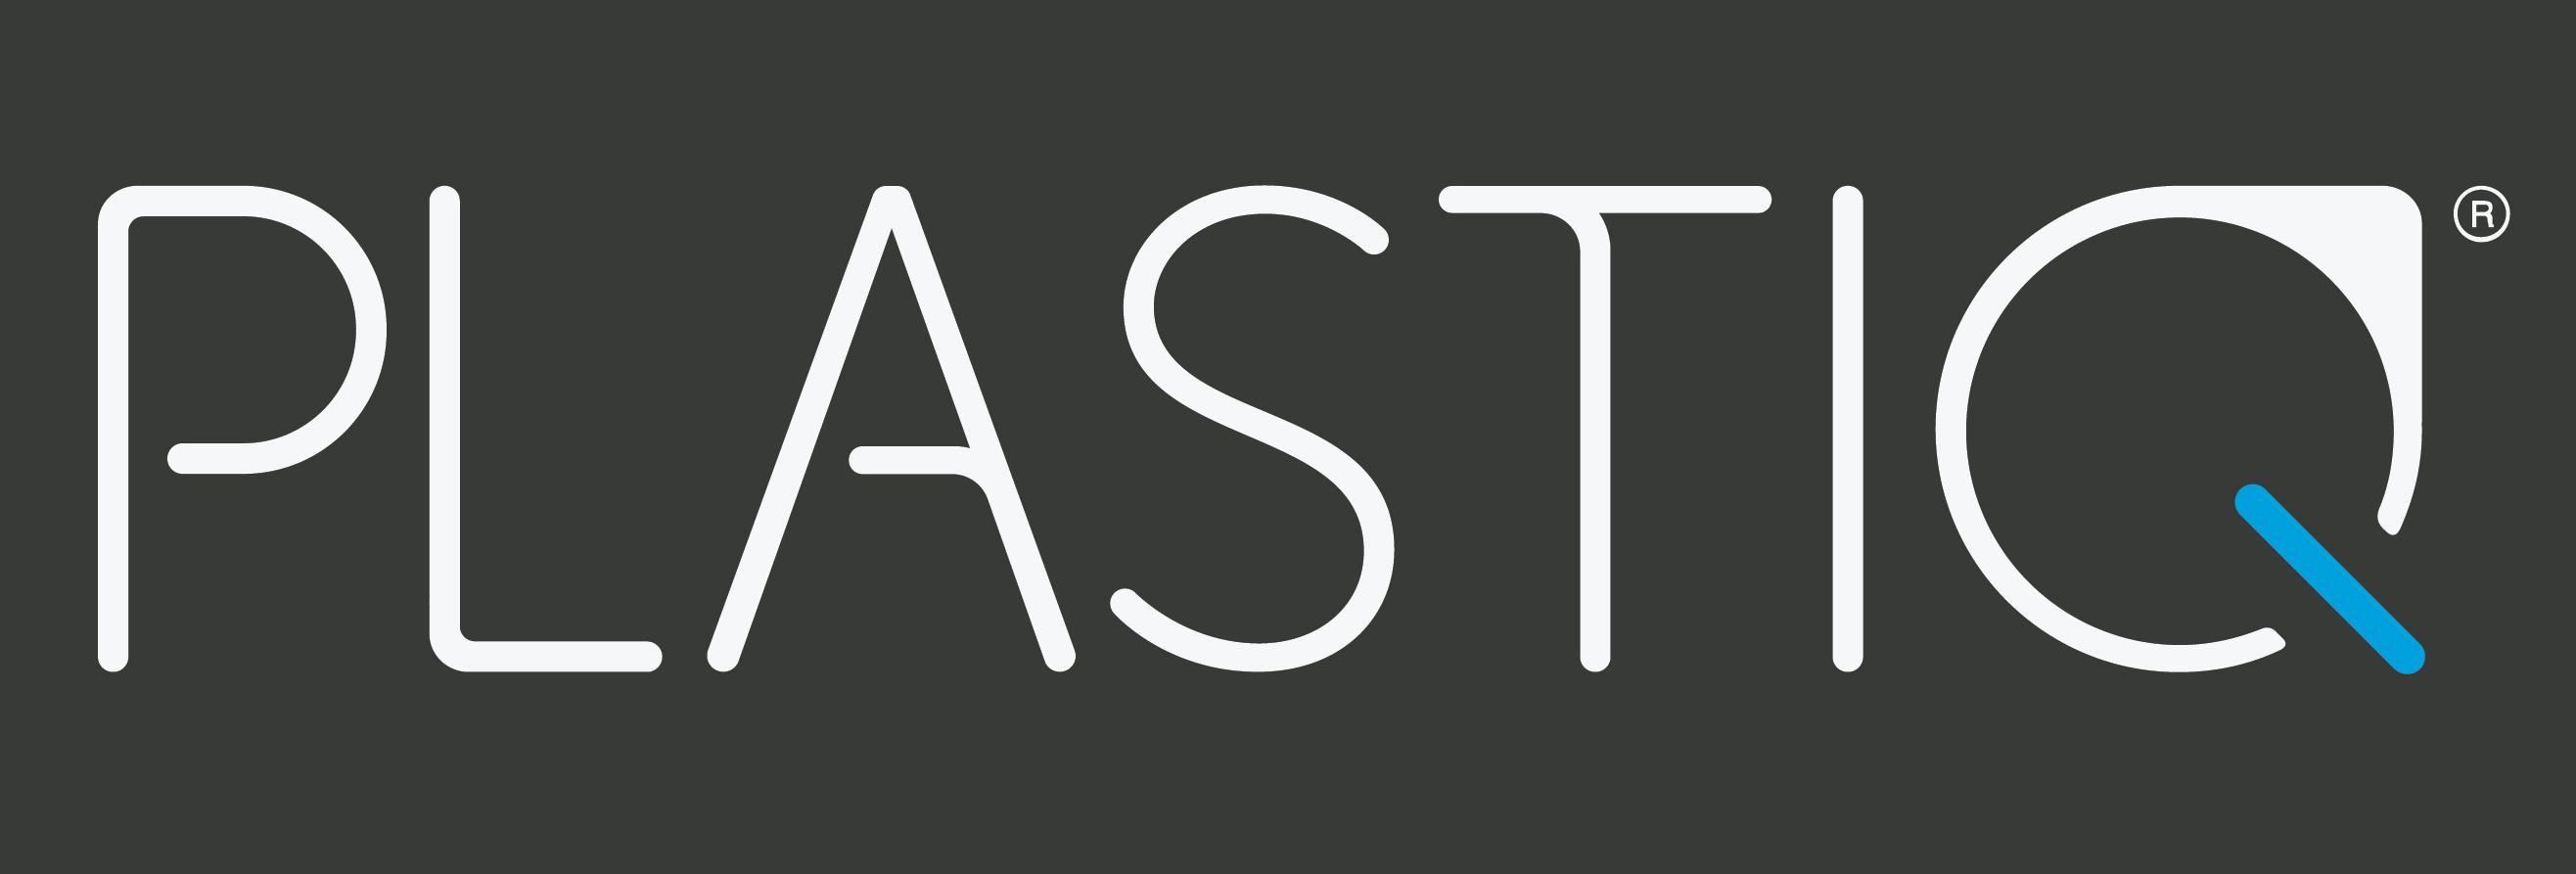 10 Questions (and Answers) About Plastiq.com - milenomics.com